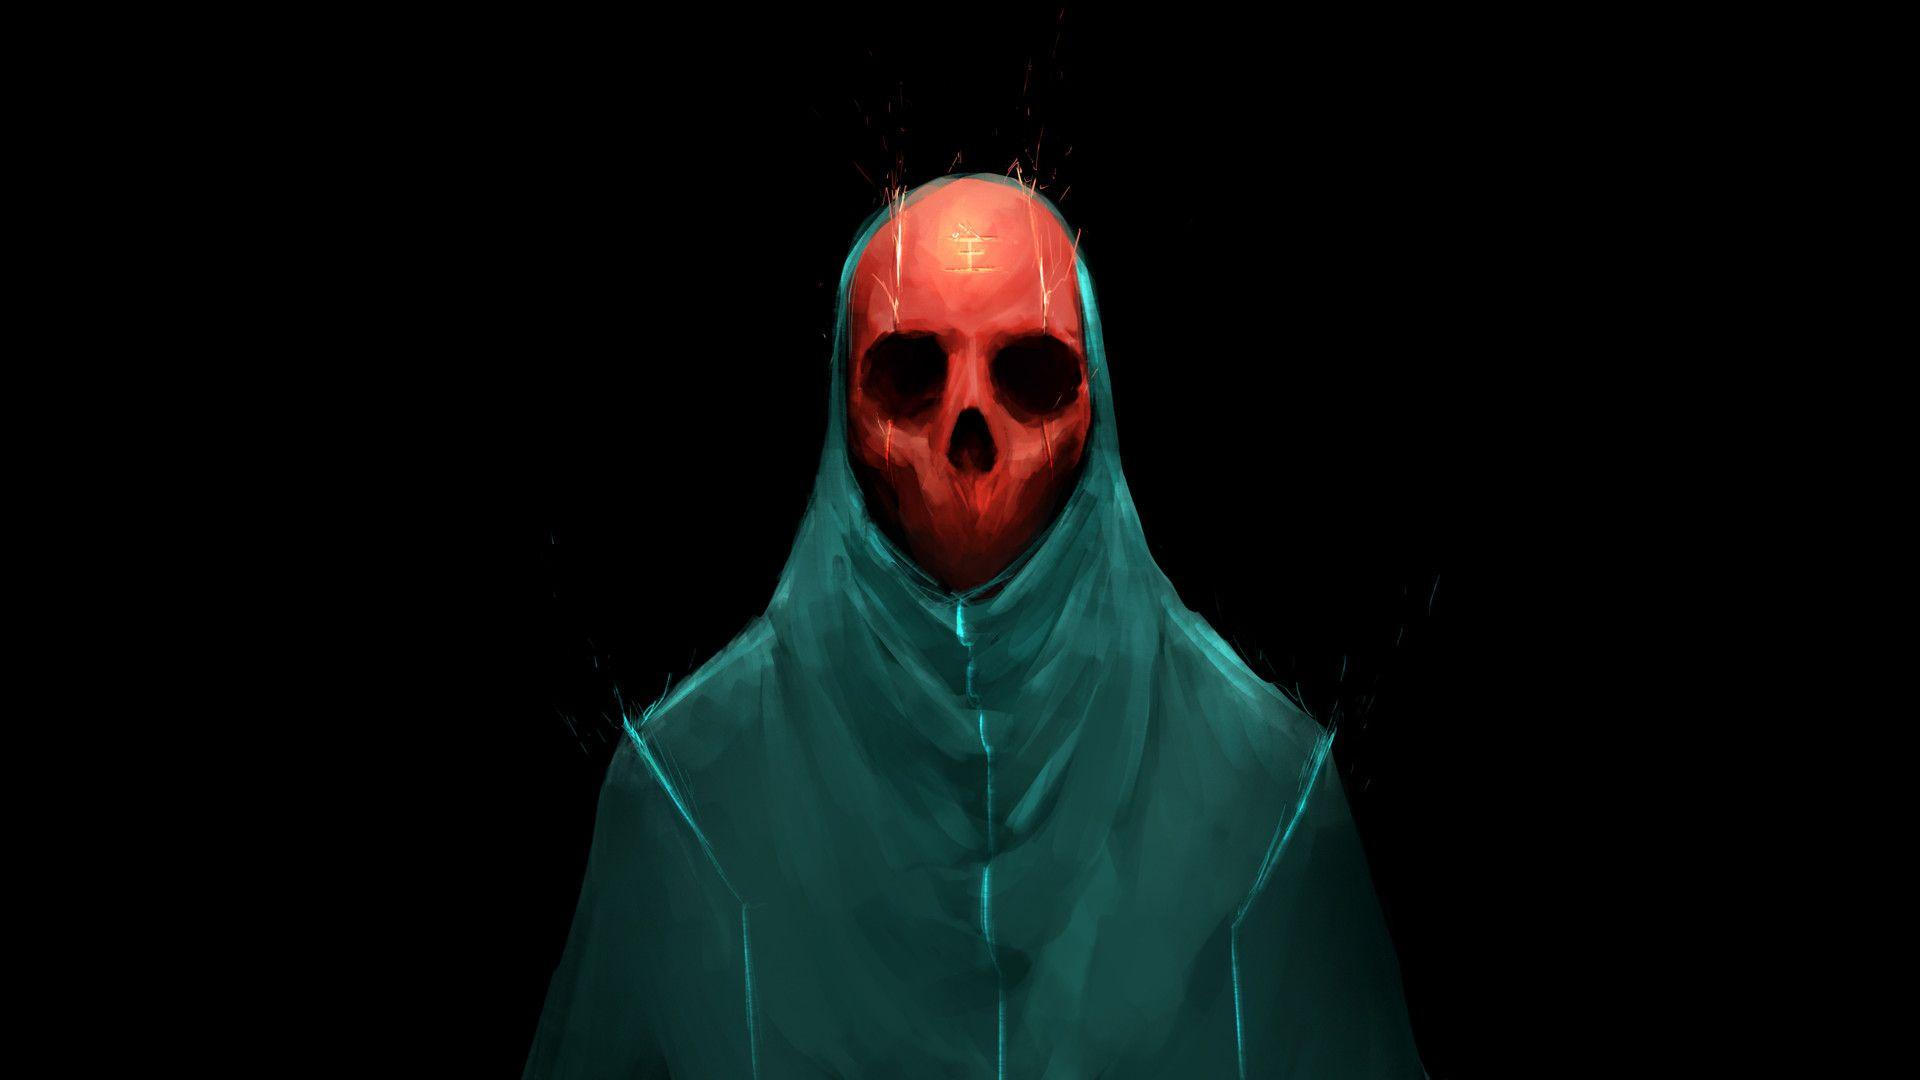 ArtStation - 主, João Mendes | Dark/weird fantasy | Pinterest ...